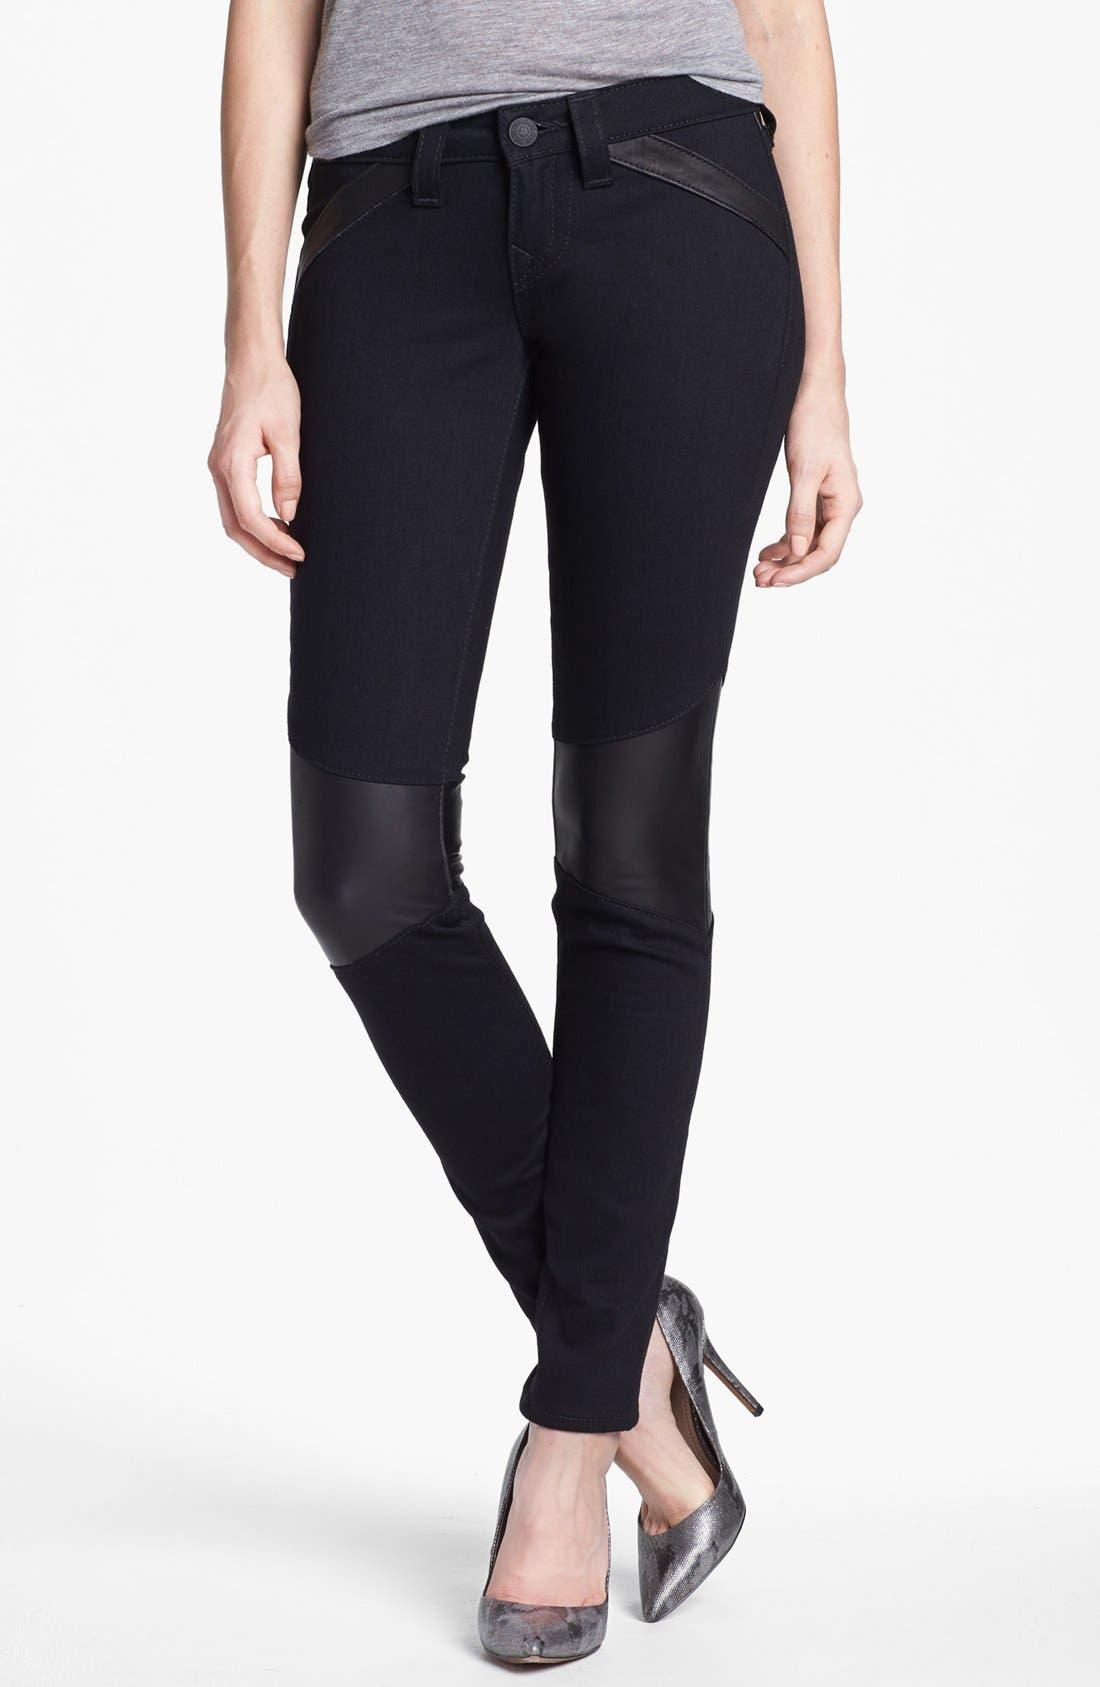 Alternate Image 1 Selected - True Religion Brand Jeans Skinny Moto Jeans (Body Rinse)